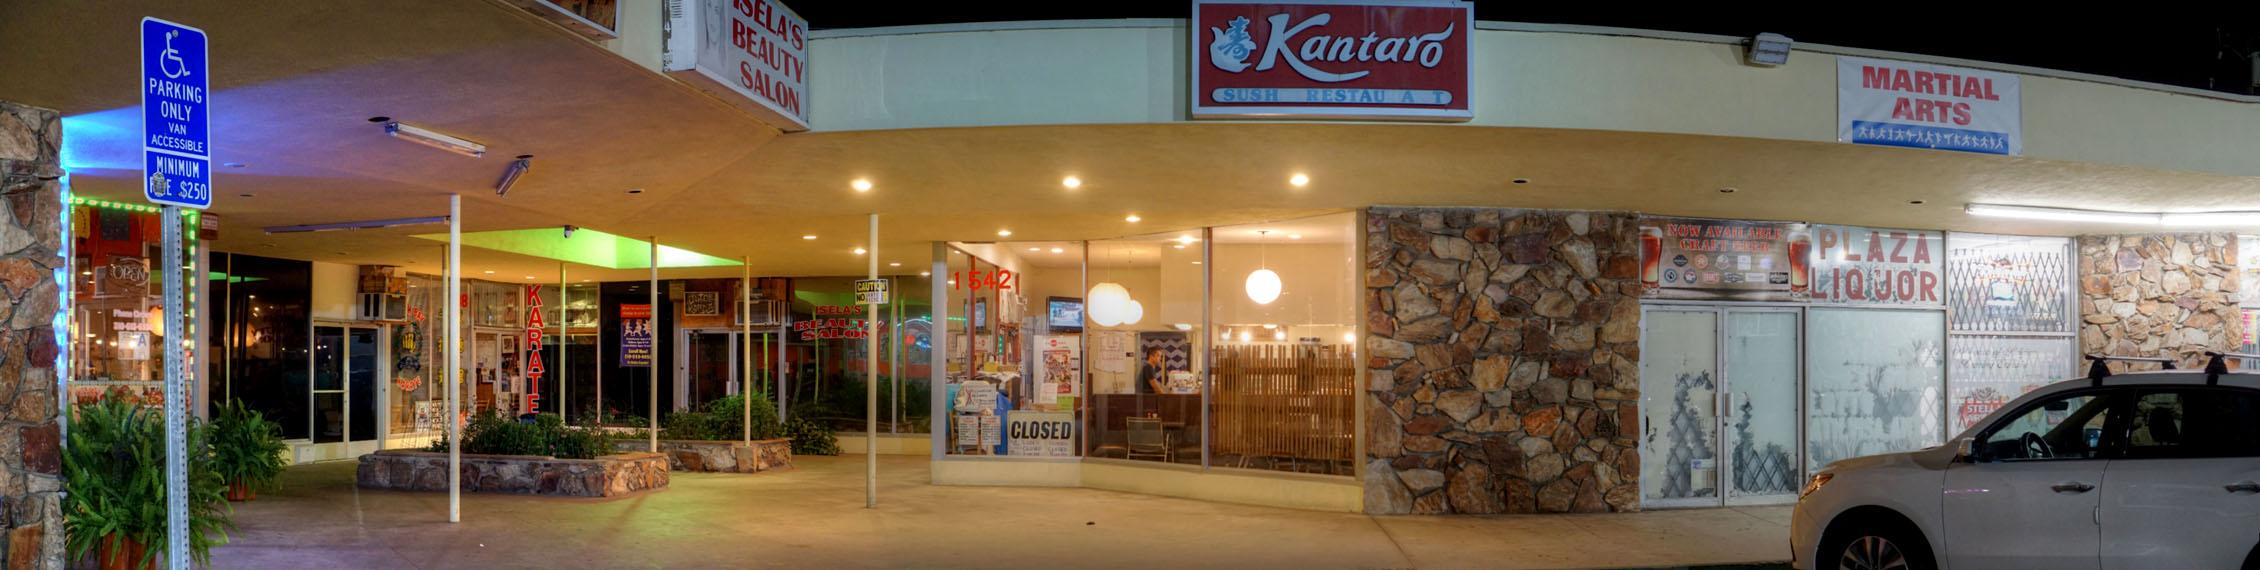 Kantaro Sushi Exterior